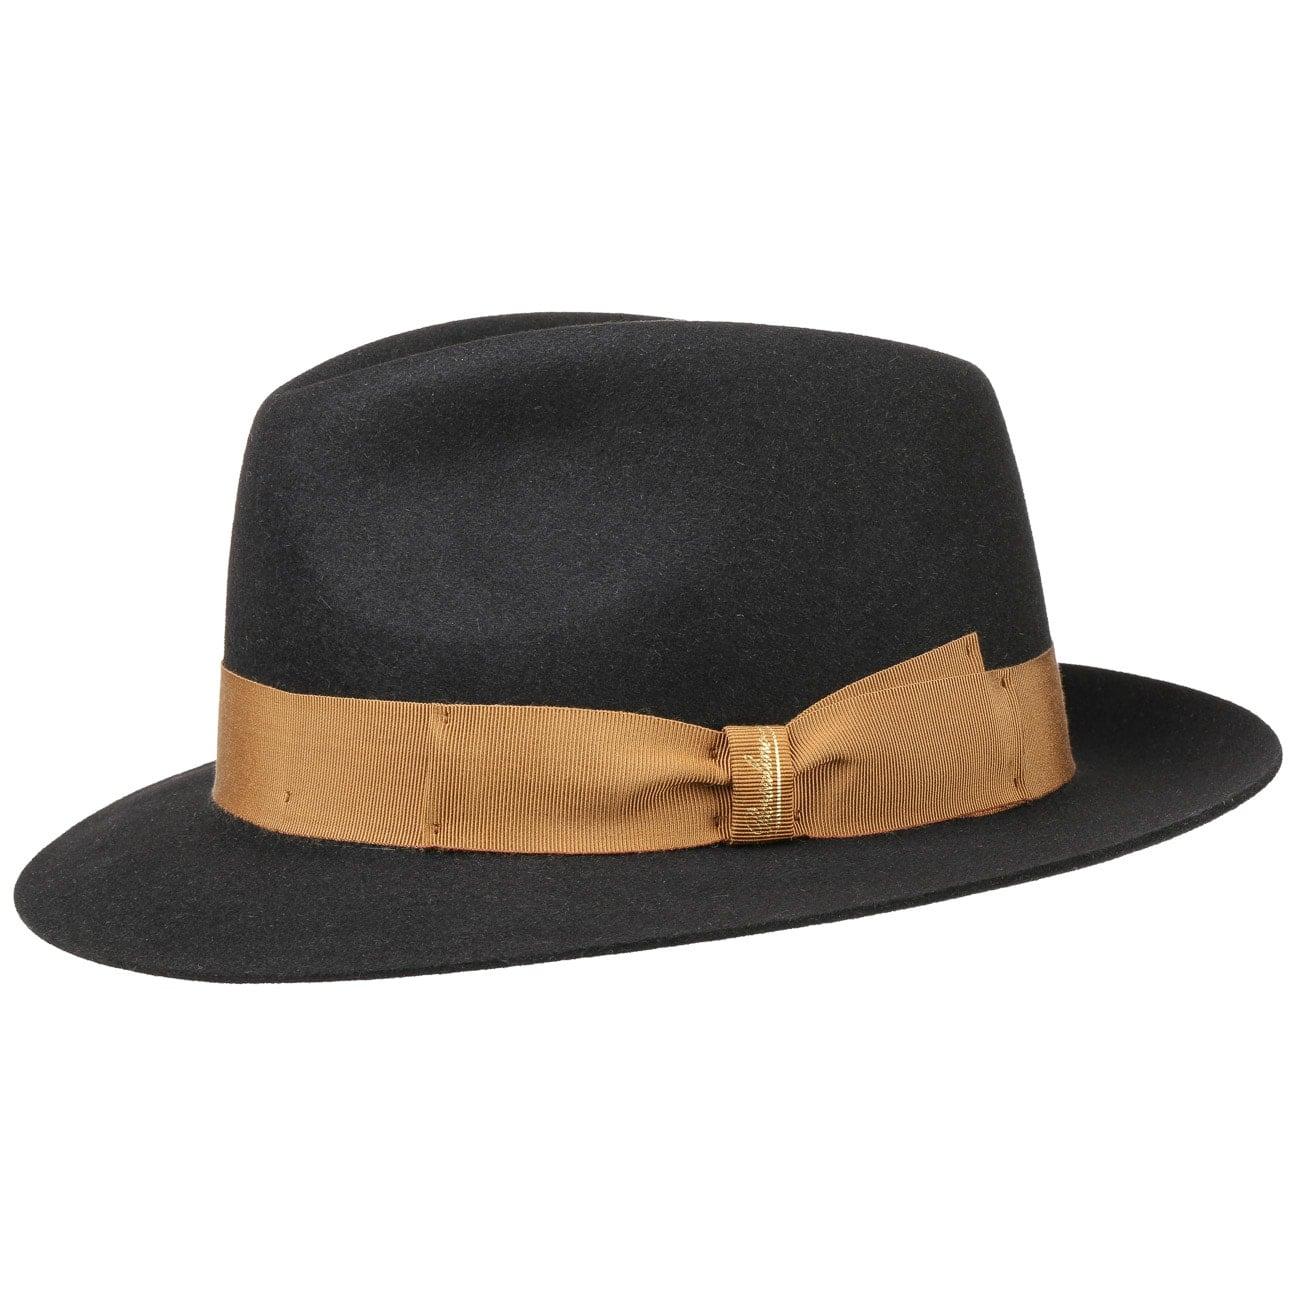 Sombrero Finissimo Twotone Fedora by Borsalino  sombrero de fieltro